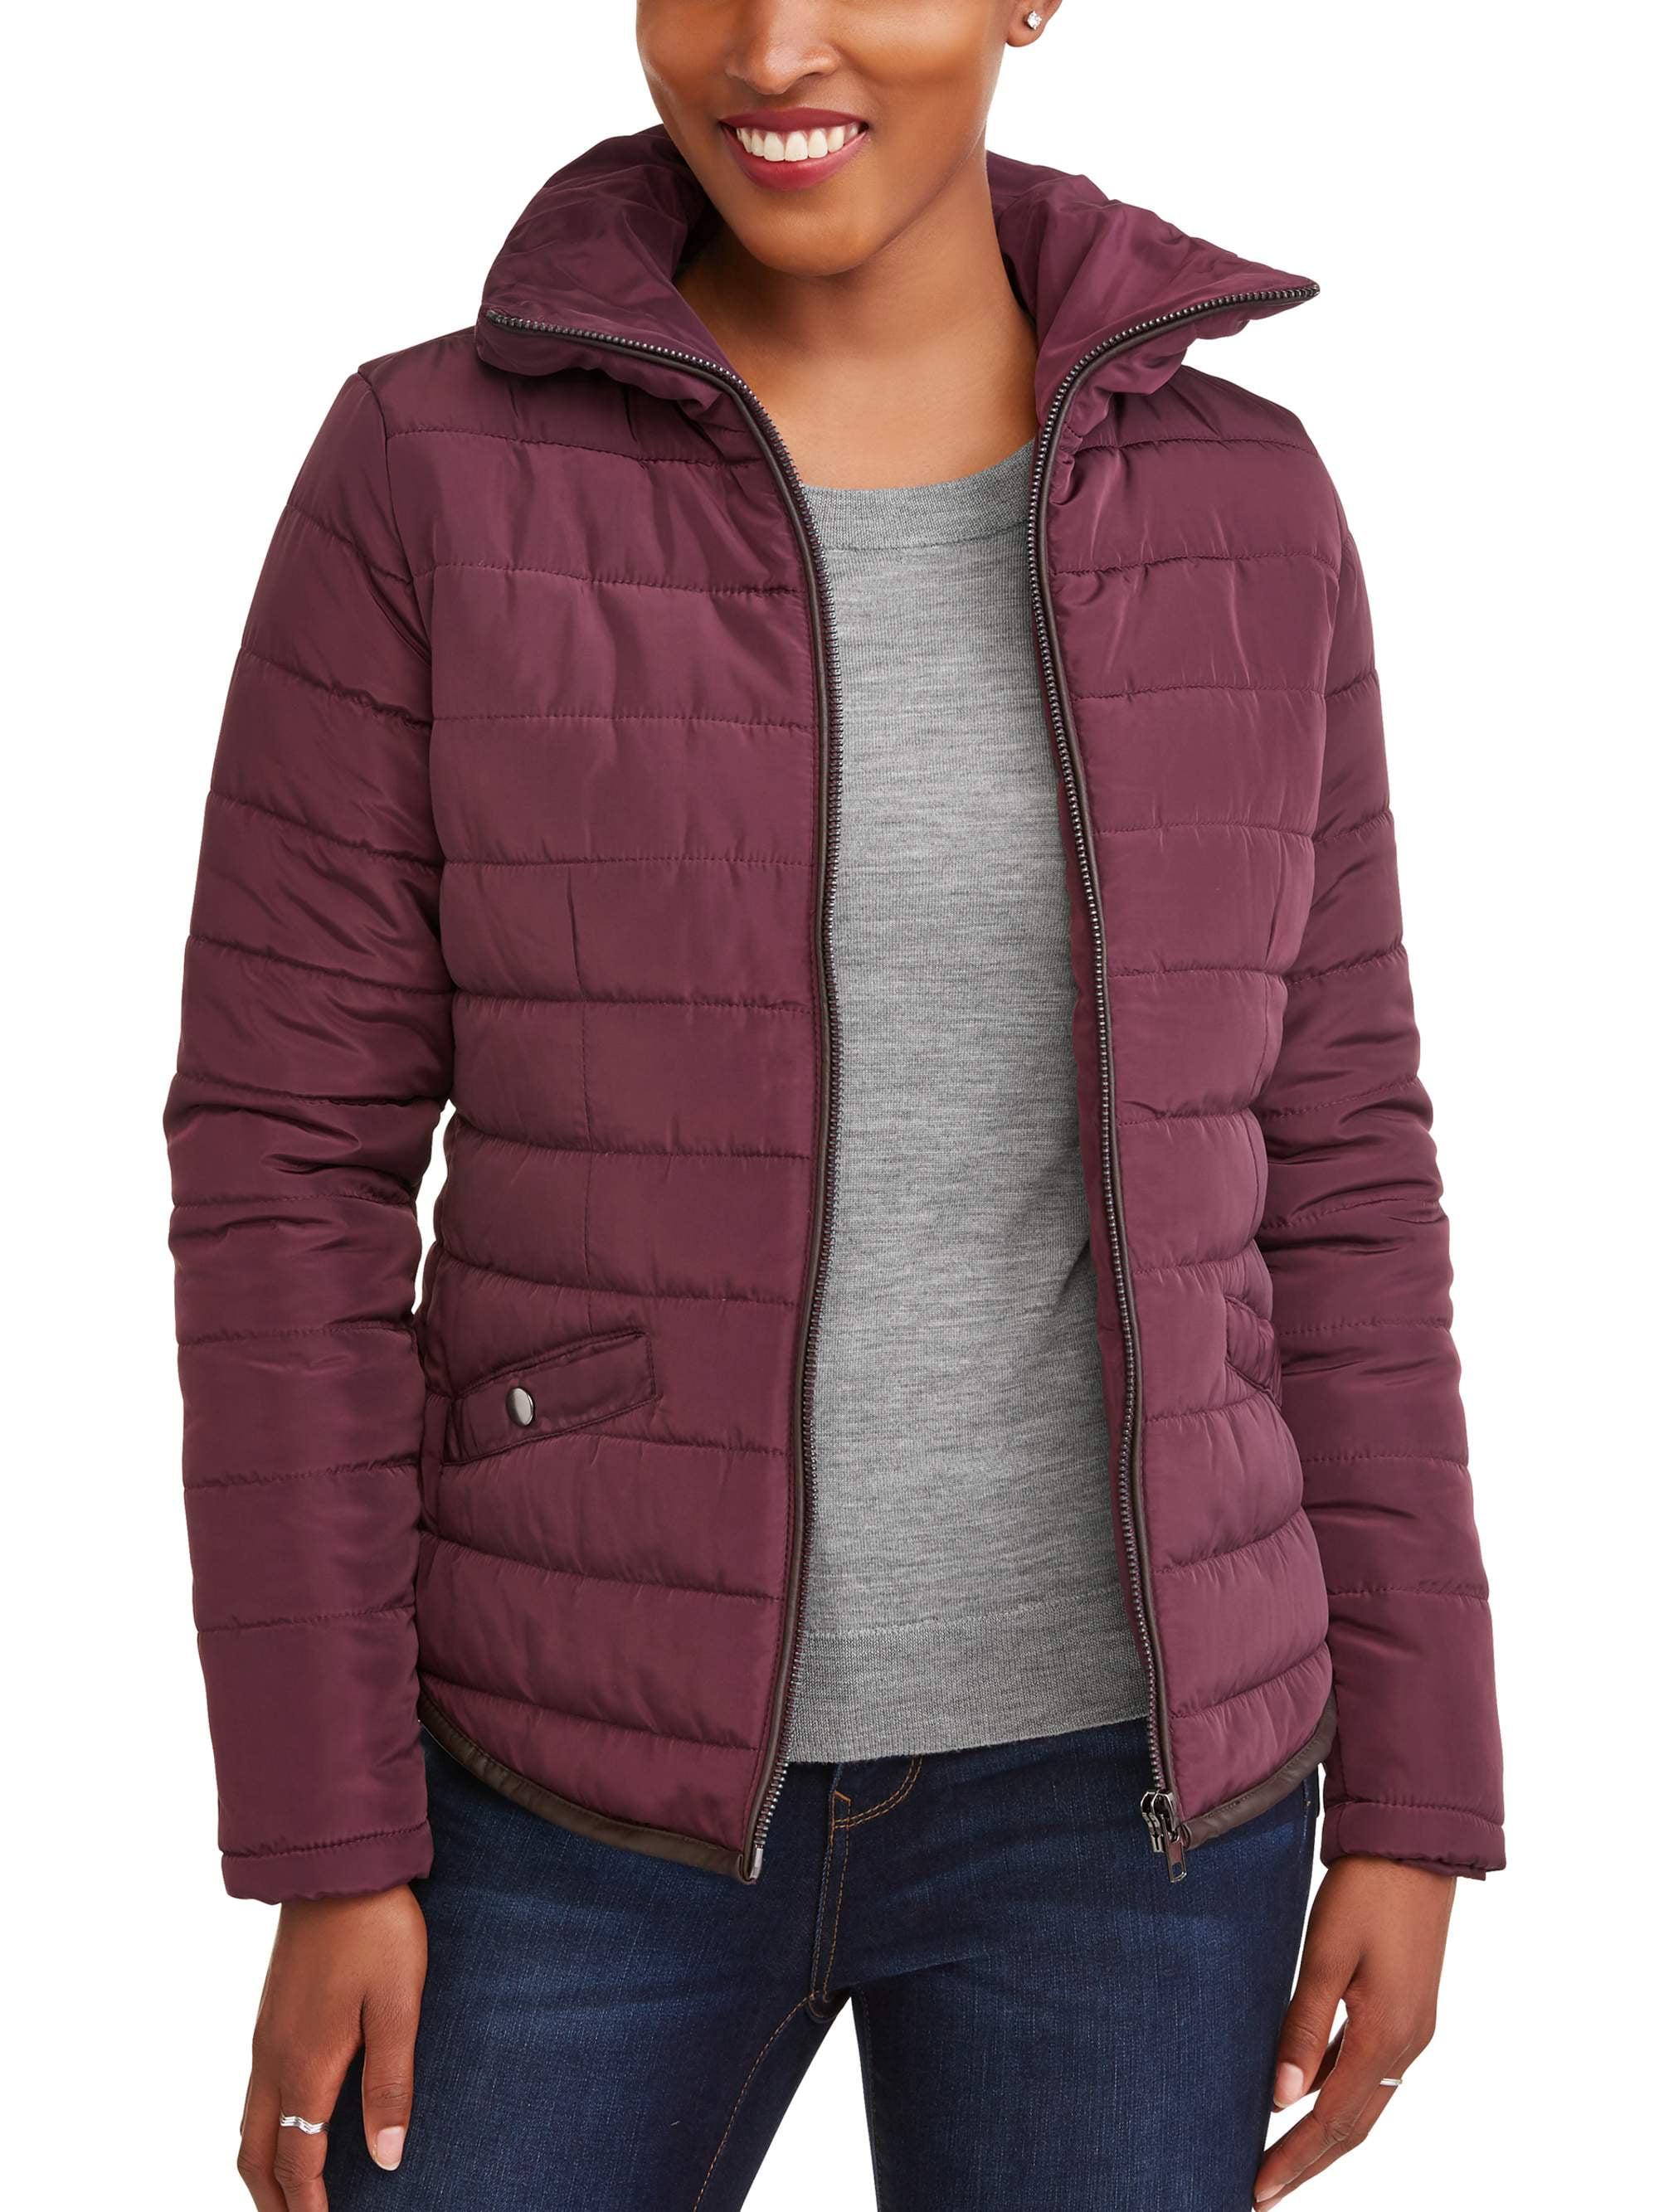 Jason Maxwell Womens Outerwear Womens Cropped Puffer Jacket Down Alternative Coat Coats & Jackets